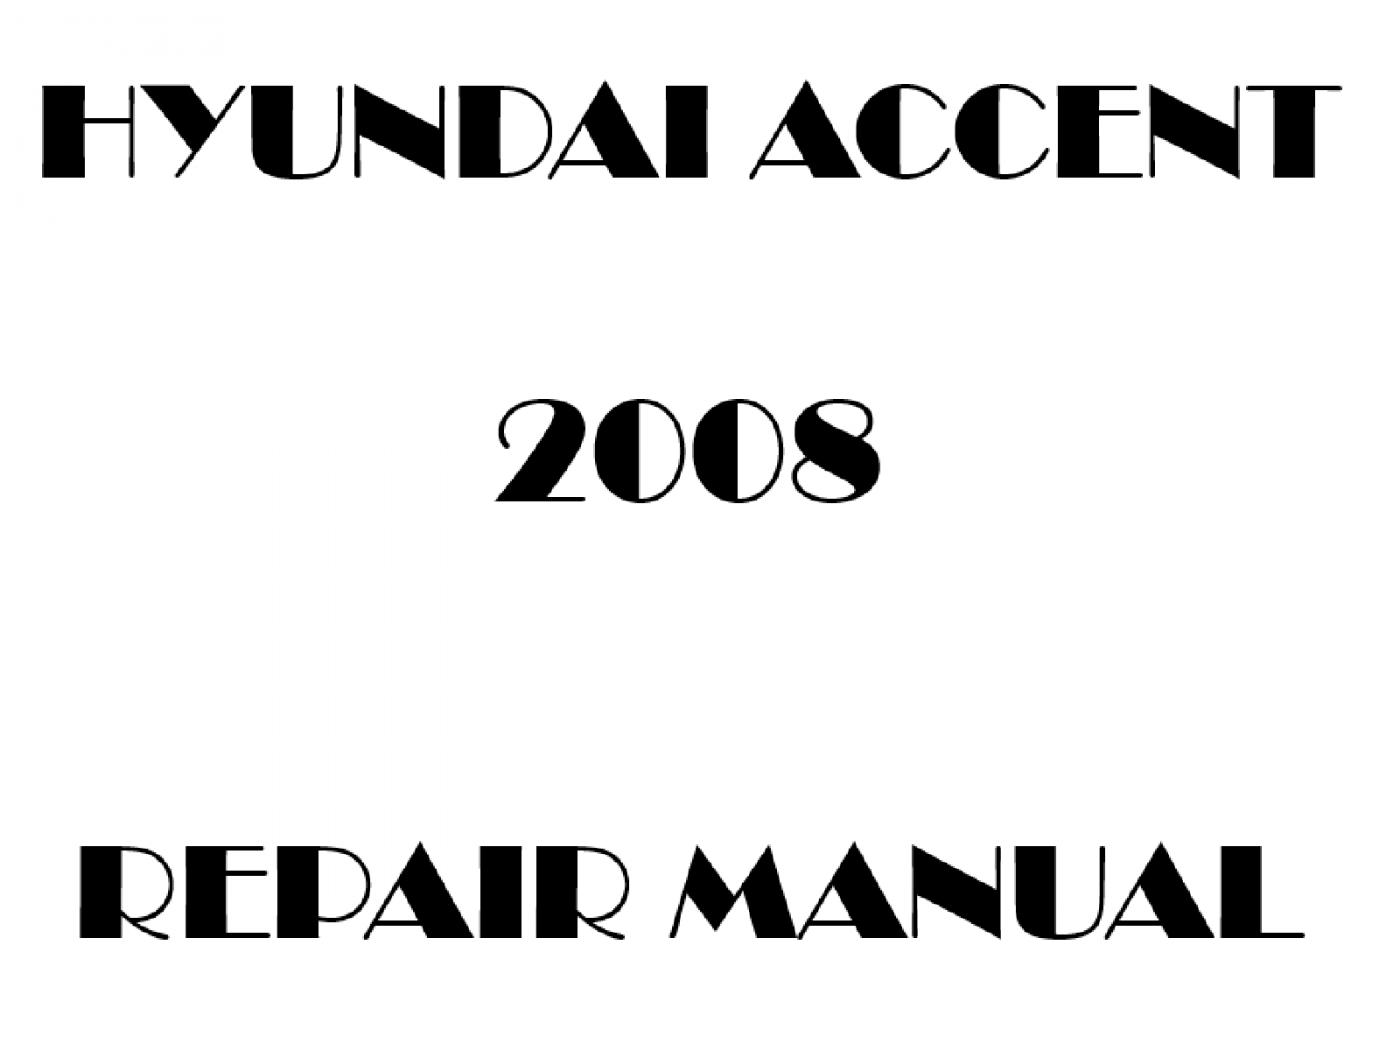 2008 Hyundai Accent repair manual